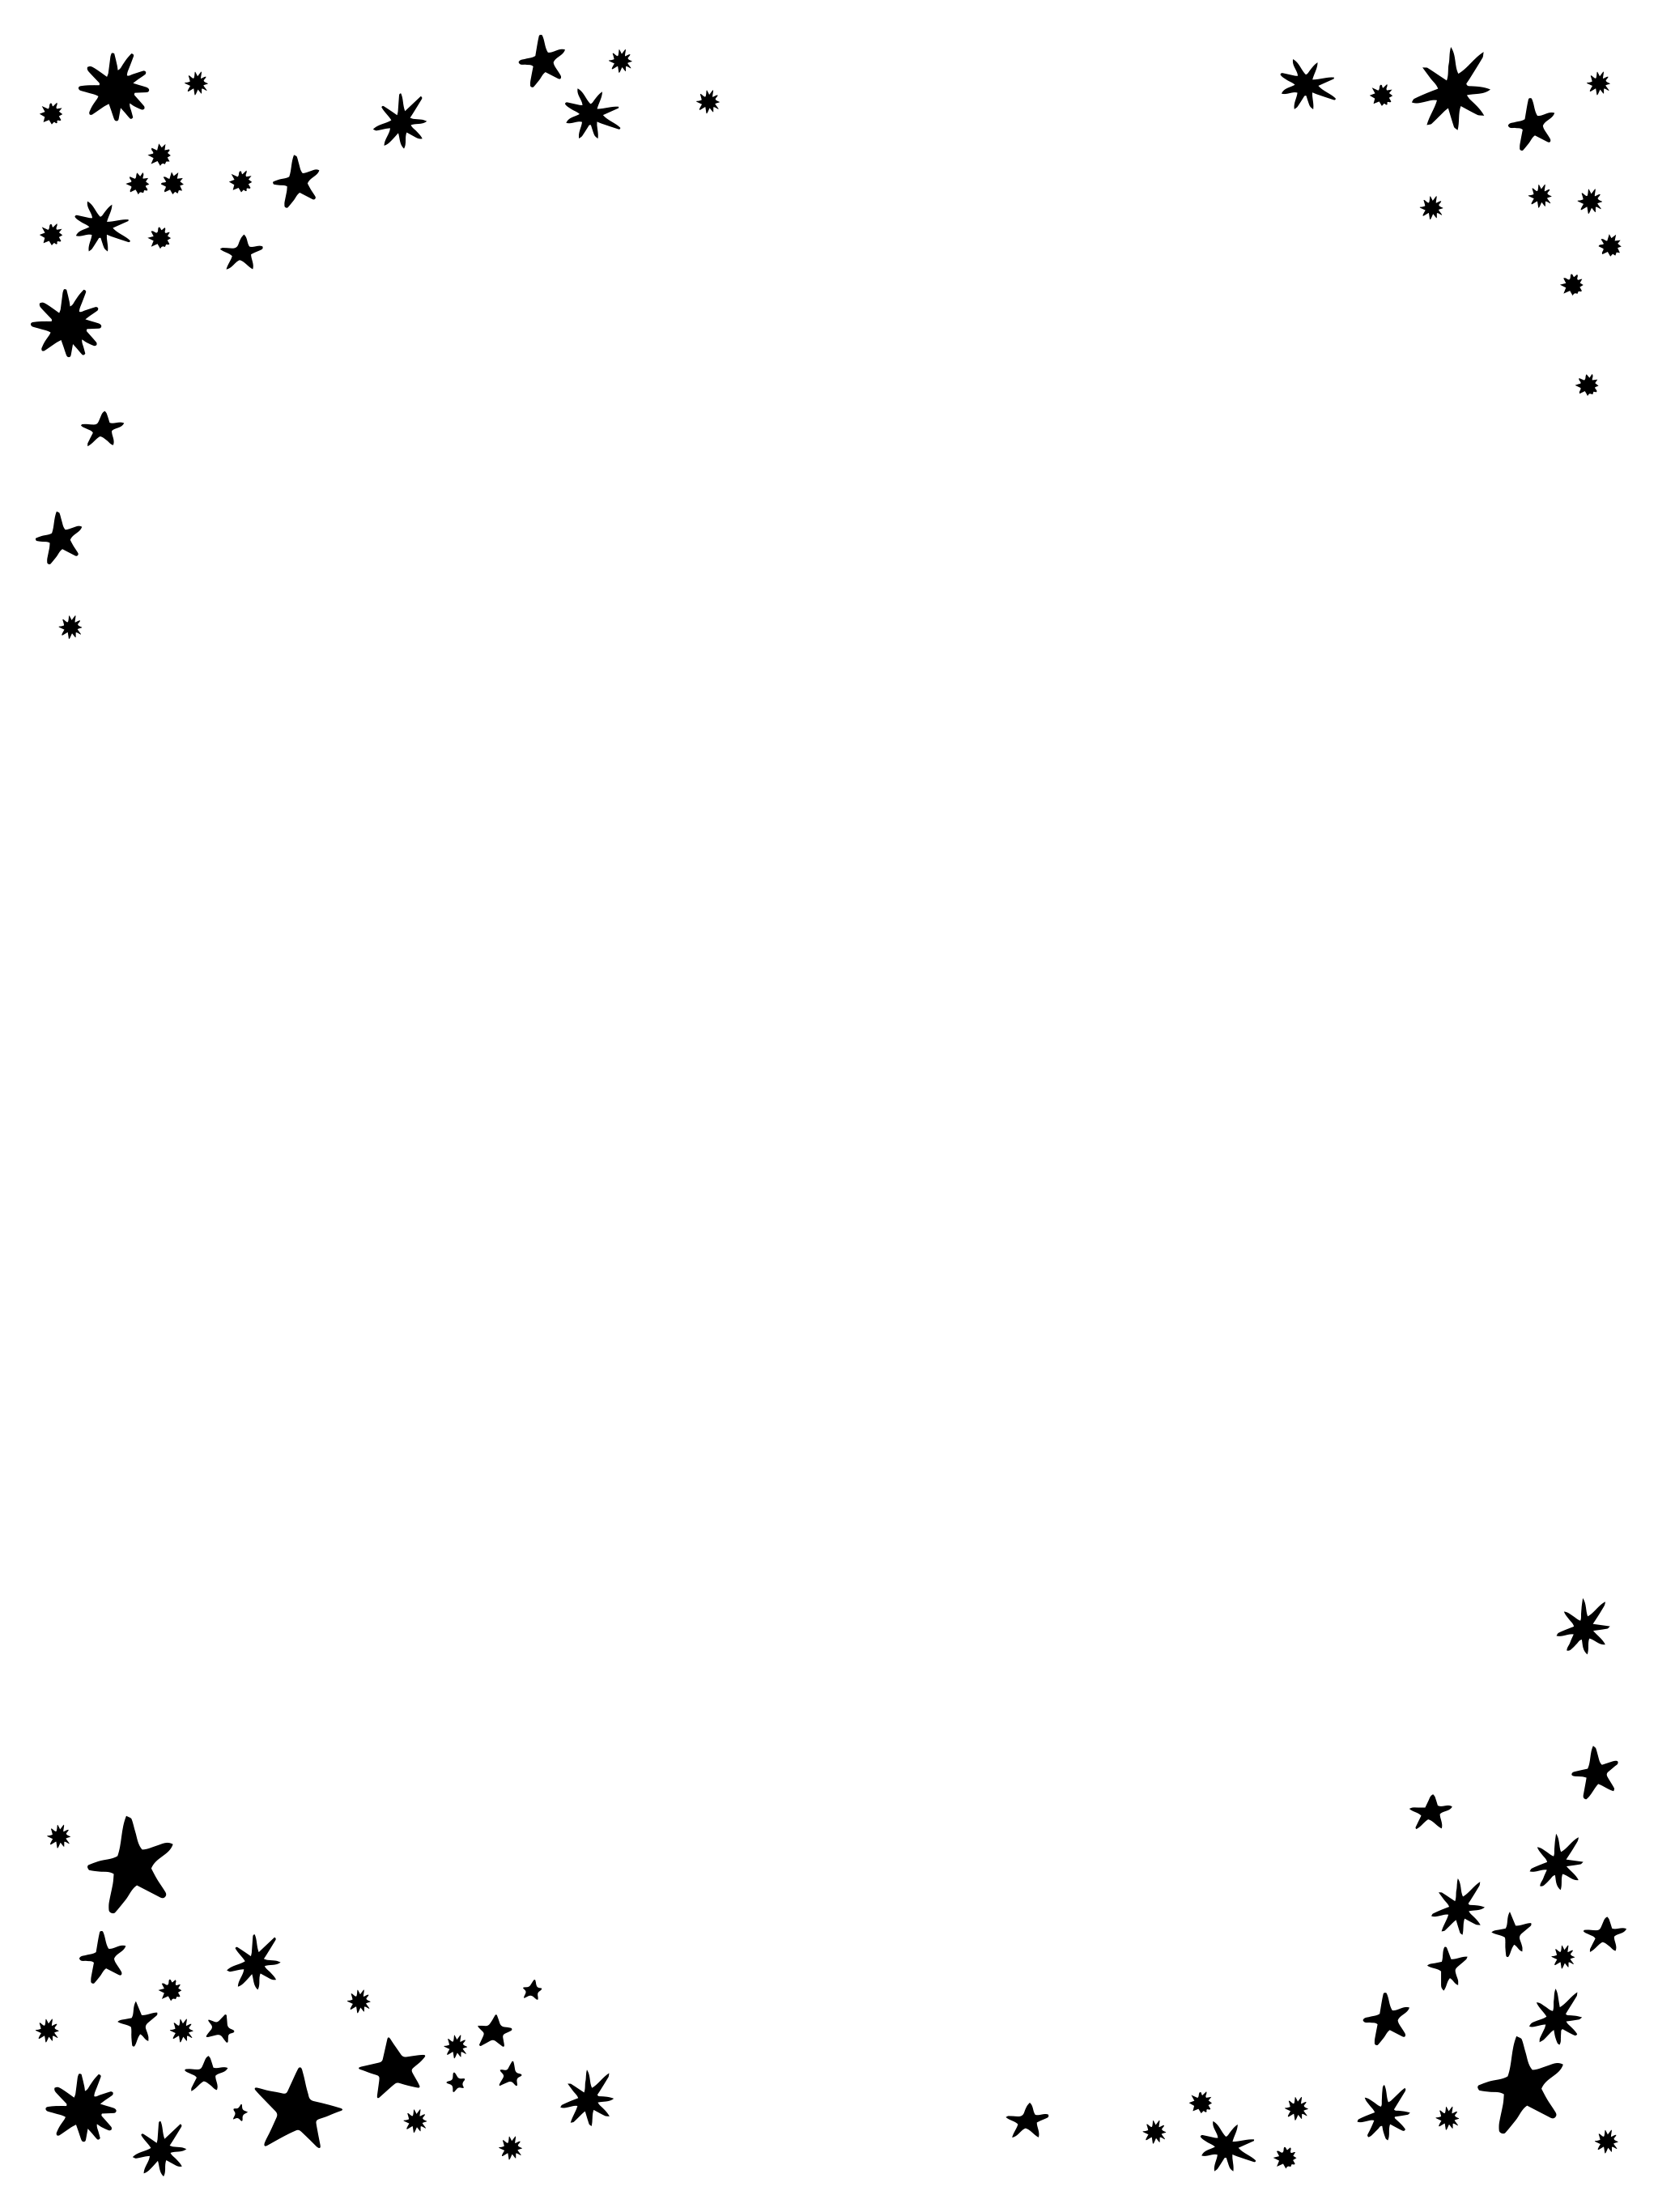 Ipad Vertical_2048x2732_Stars_Black.png